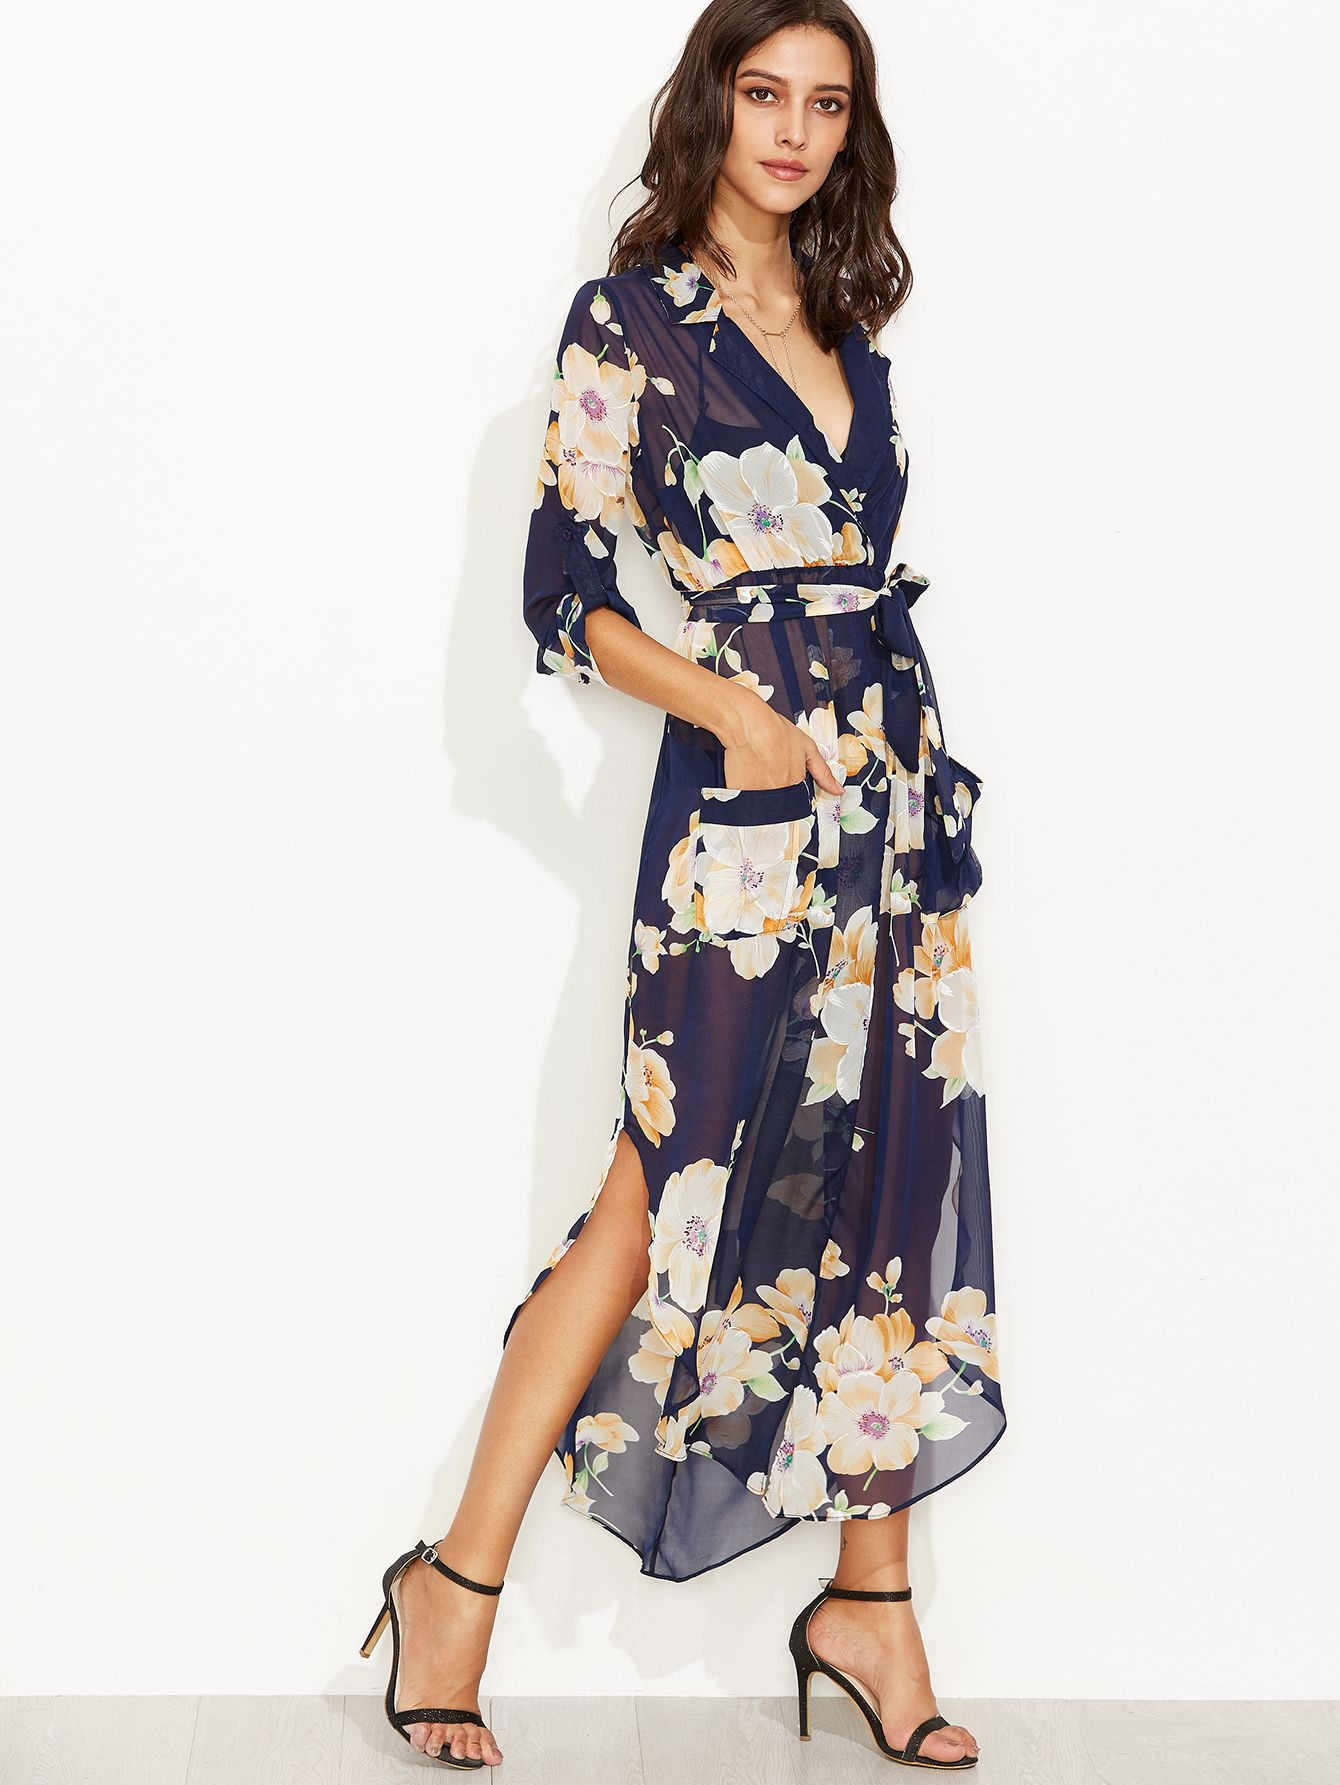 Floral Print Self Tie Surplice Wrap Sheer Dress | Chiffon kleid ...